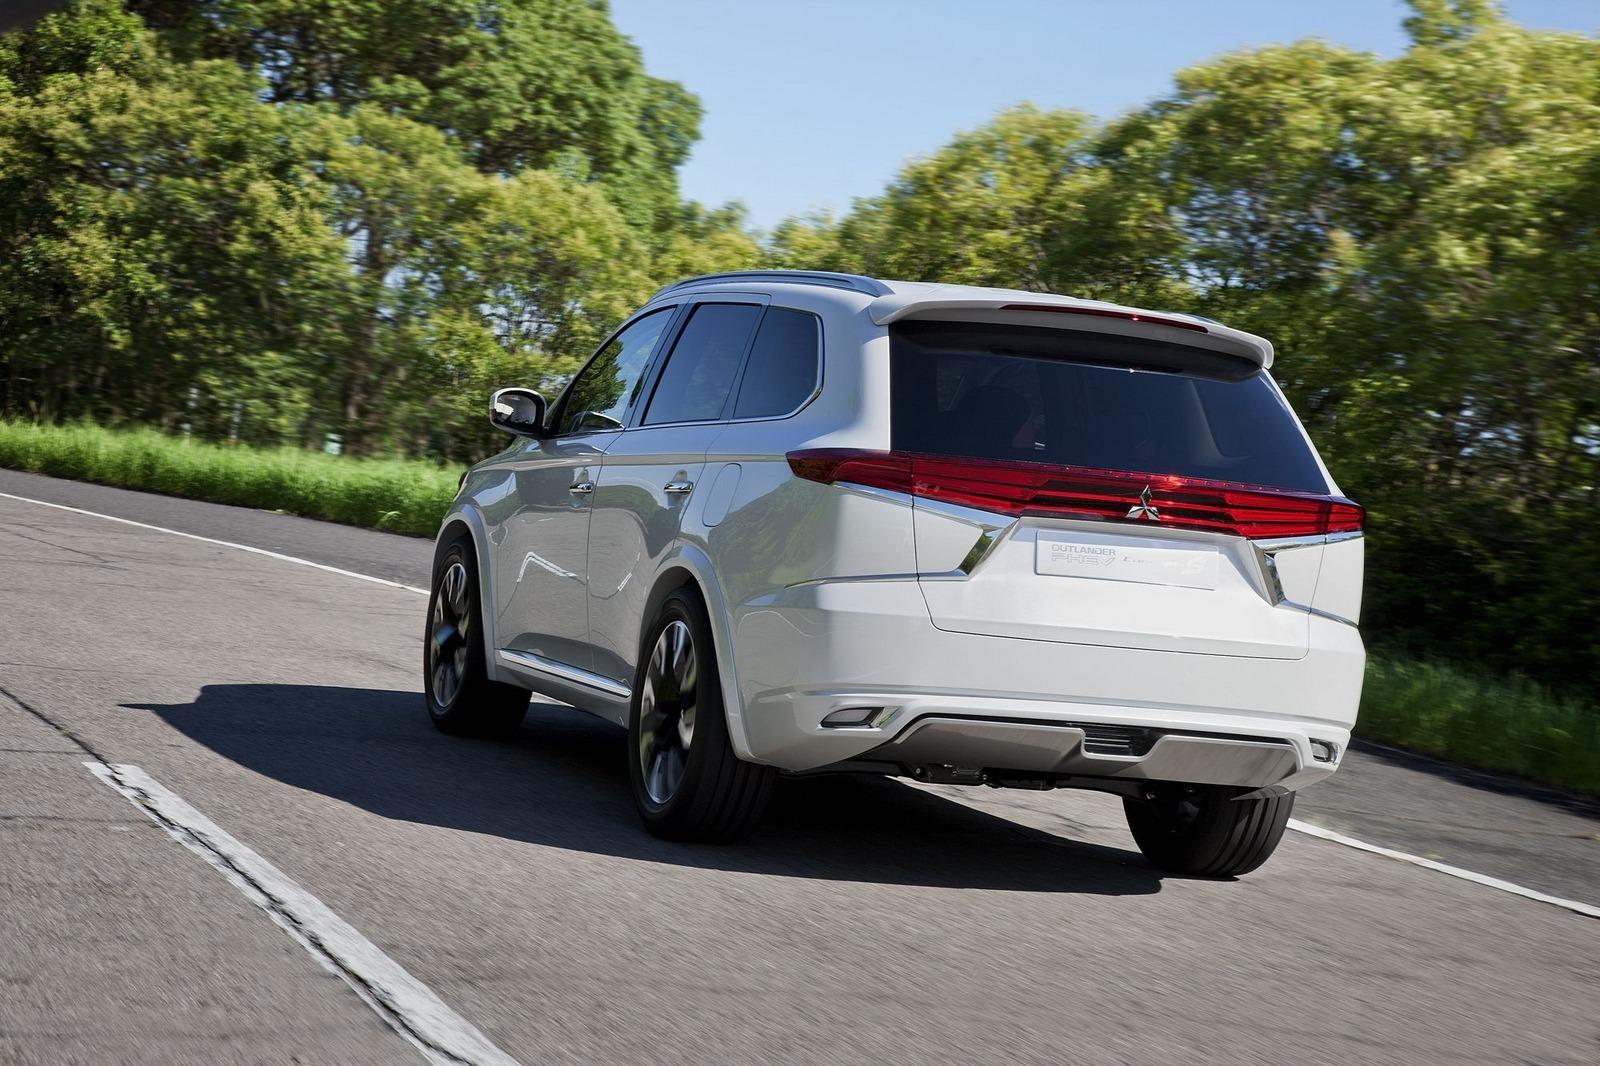 Foto de Mitsubishi Outlander PHEV Concept-S (41/49)